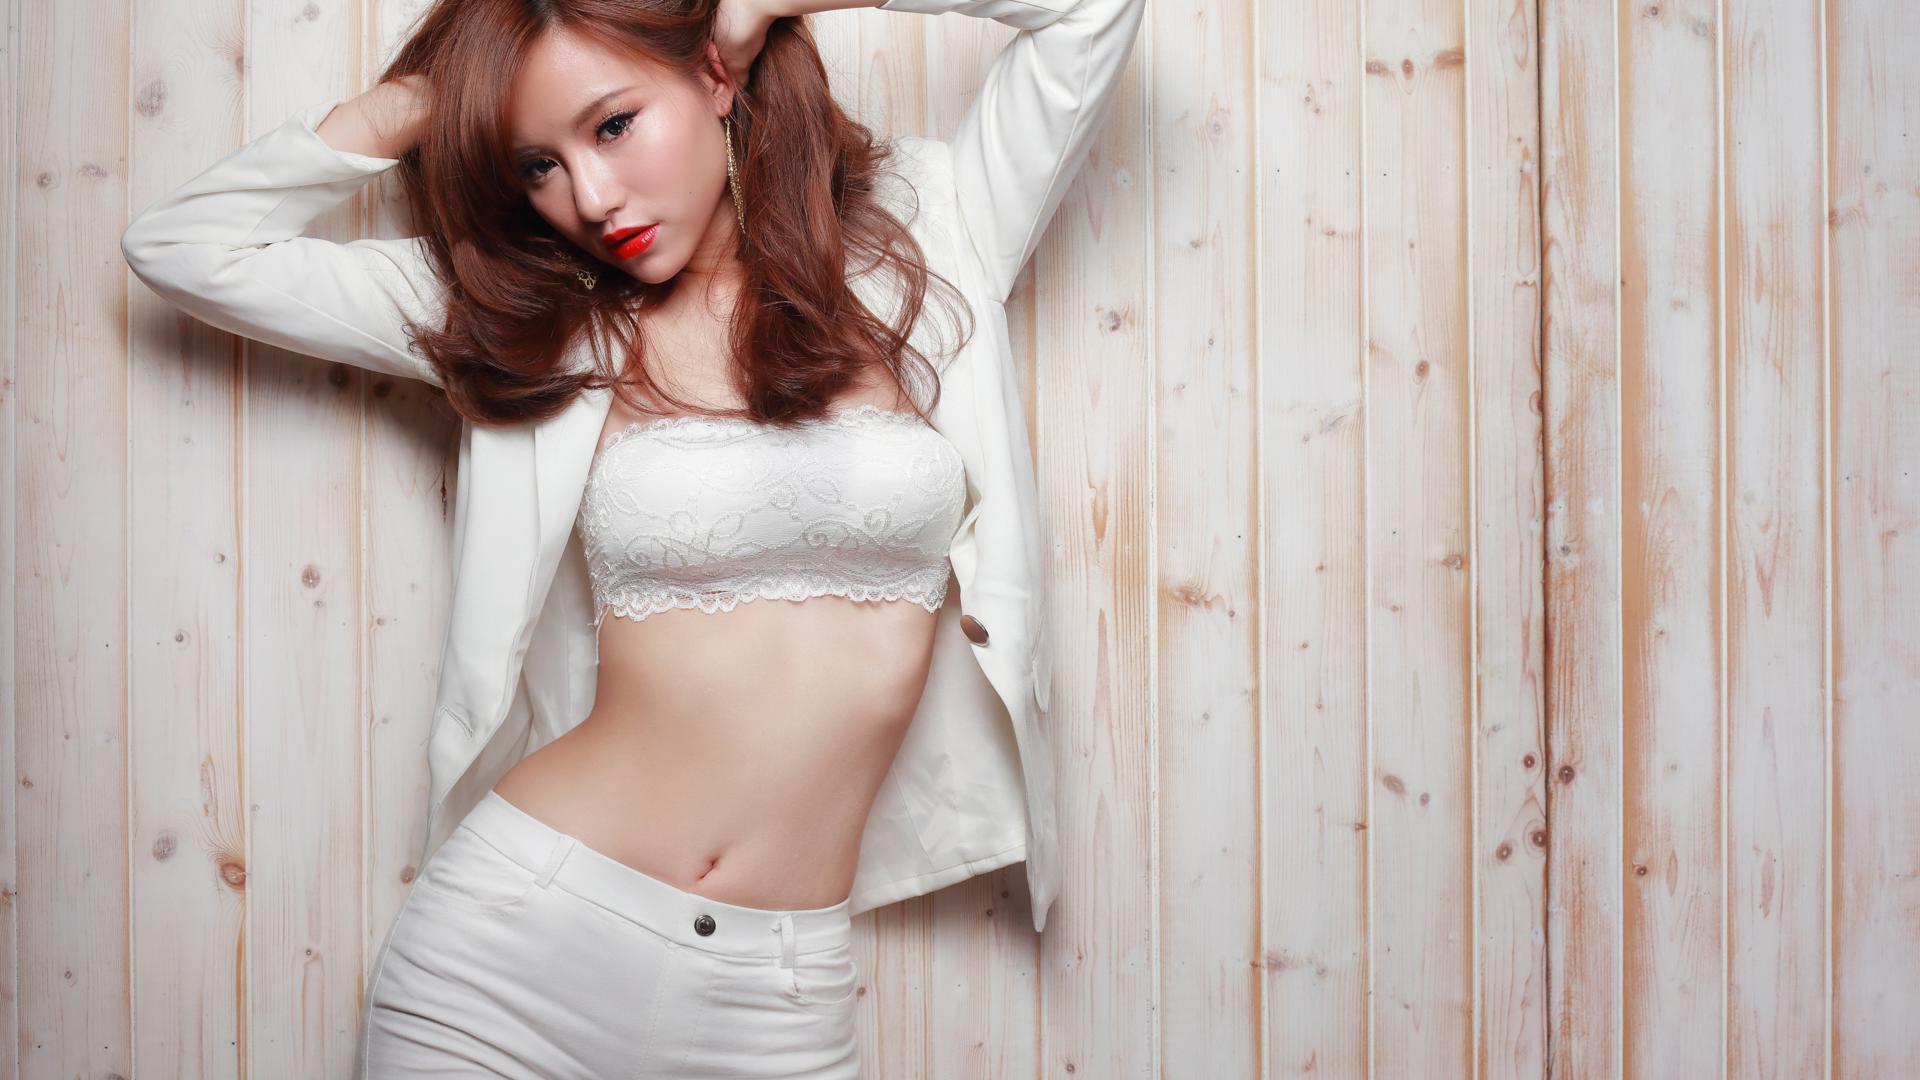 Free pics voyeur women undressing